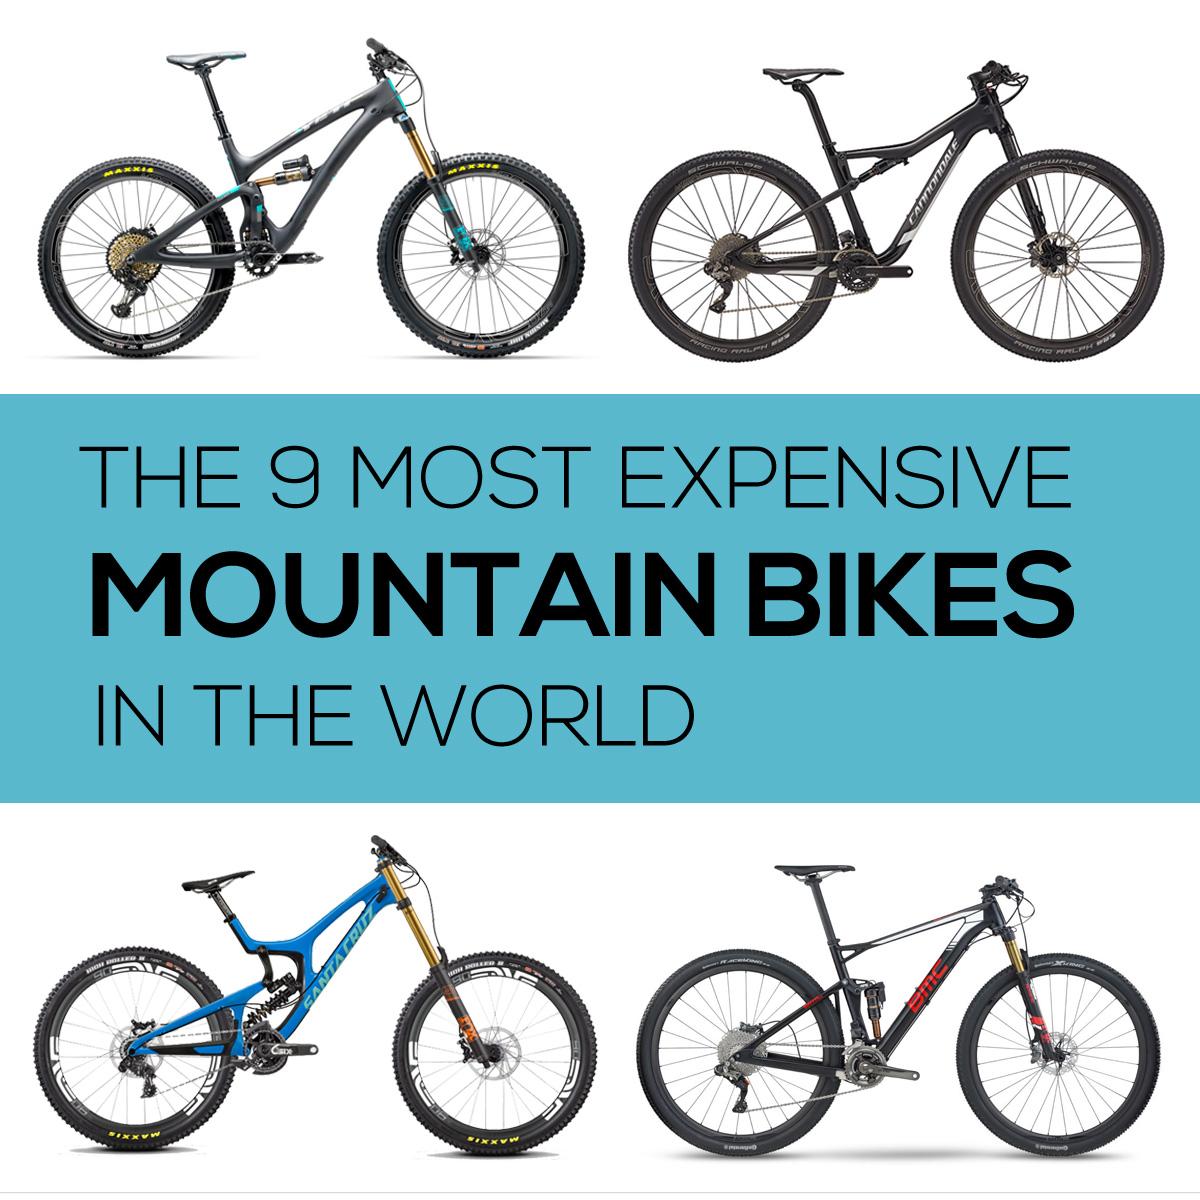 c9cd25a60a7 10 Most Popular Mountain Bike Articles of 2017 - Singletracks ...